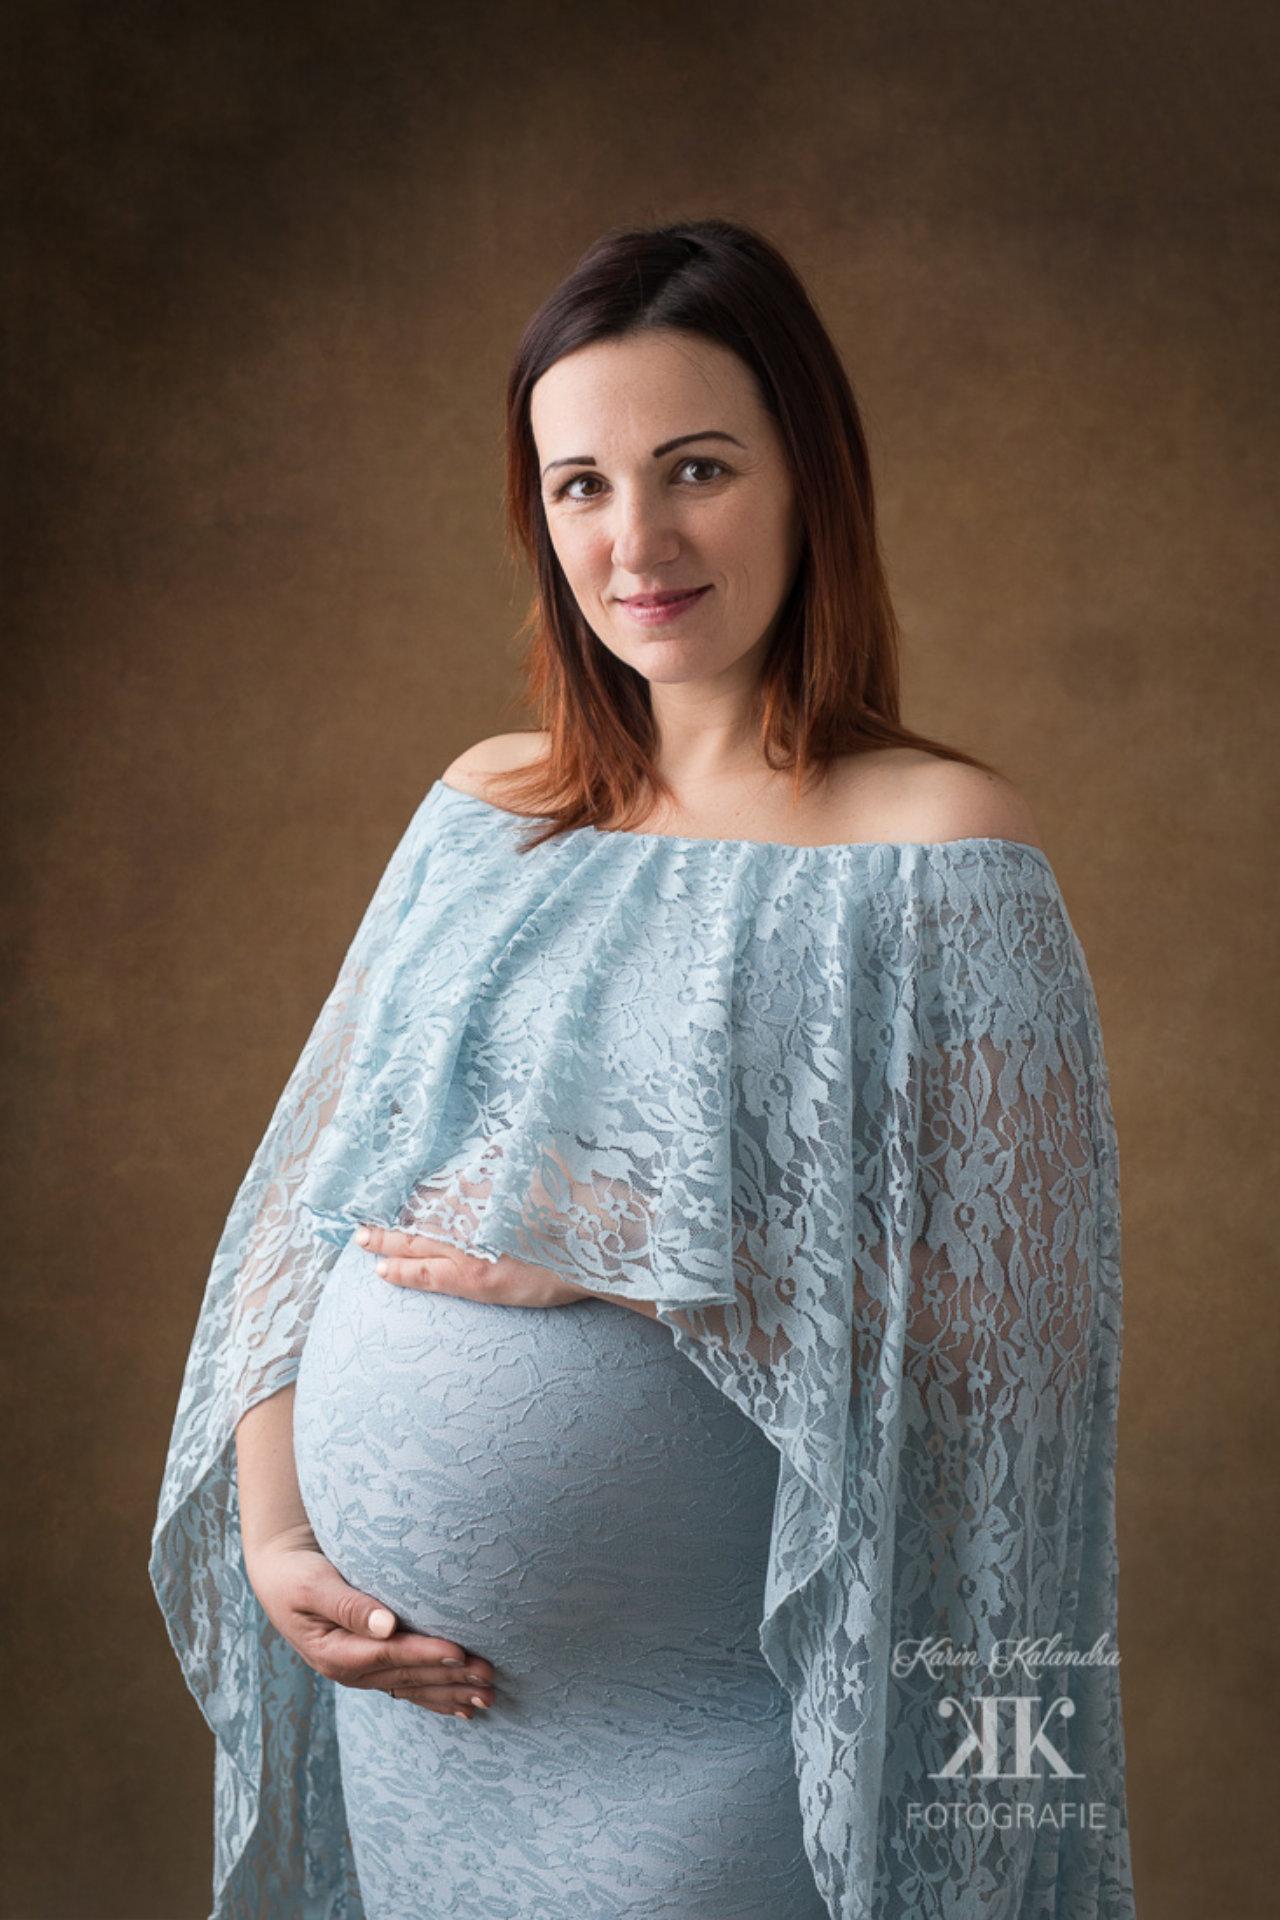 Schwangerschafts-Fotoshooting #5